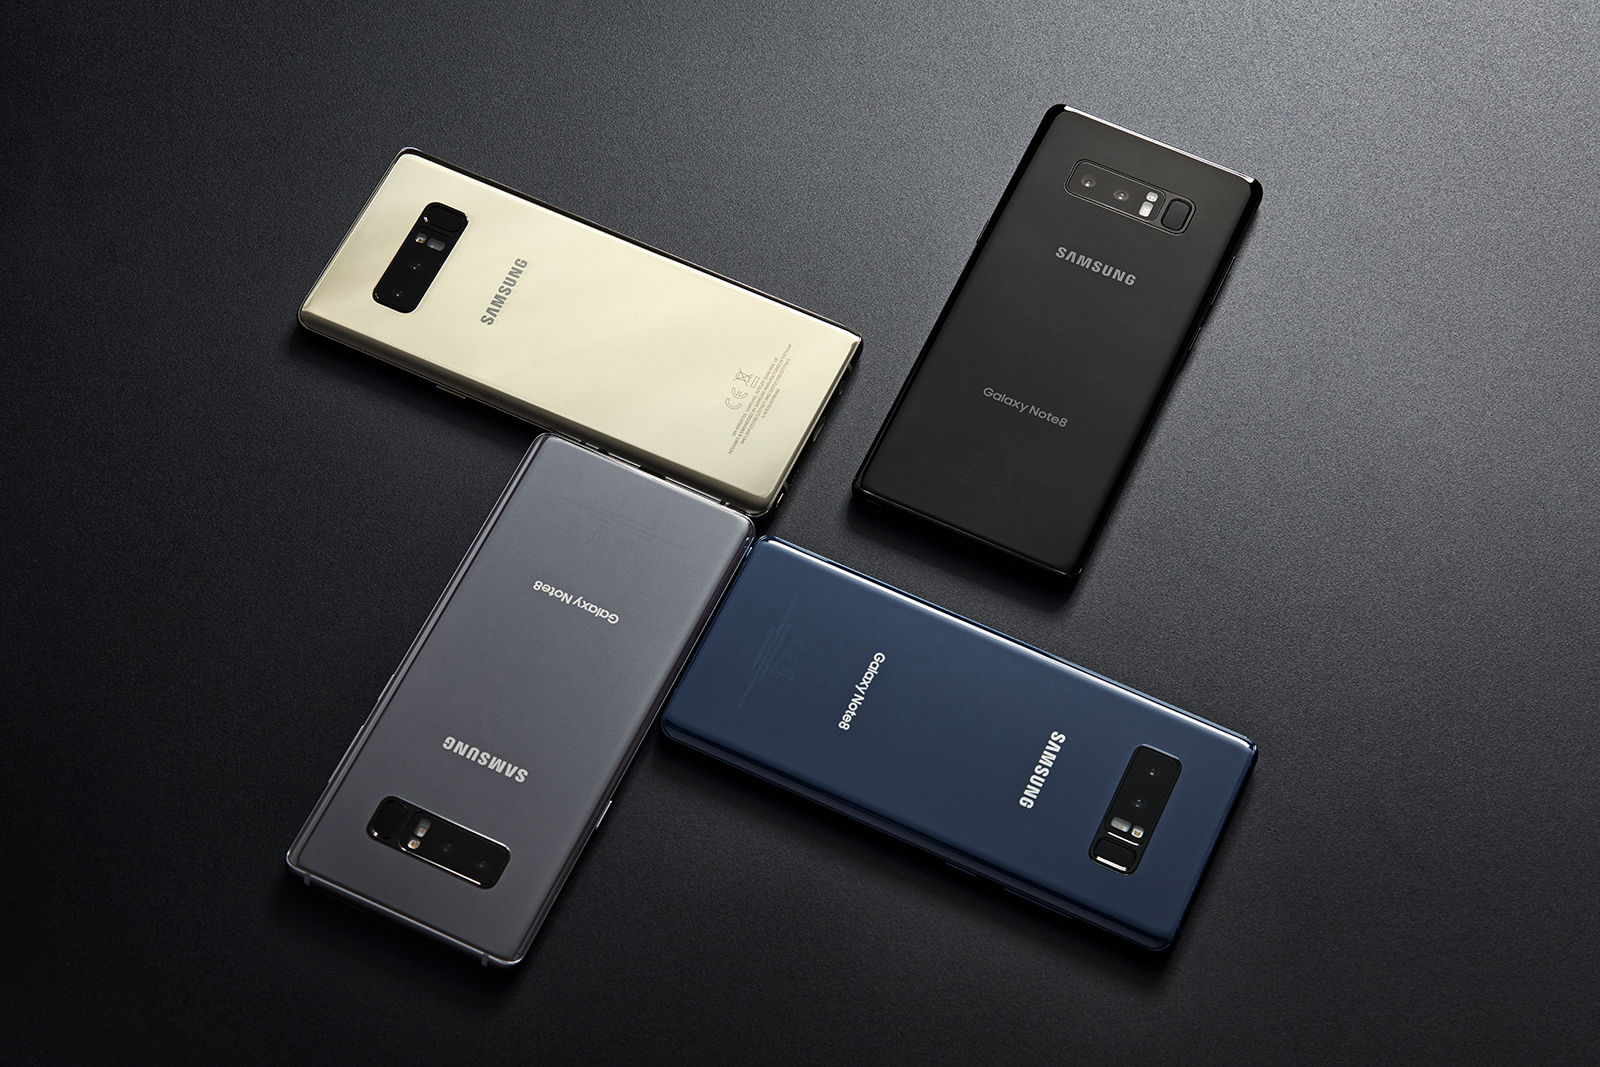 Harga Spesifikasi Samsung Galaxy Note 8 1